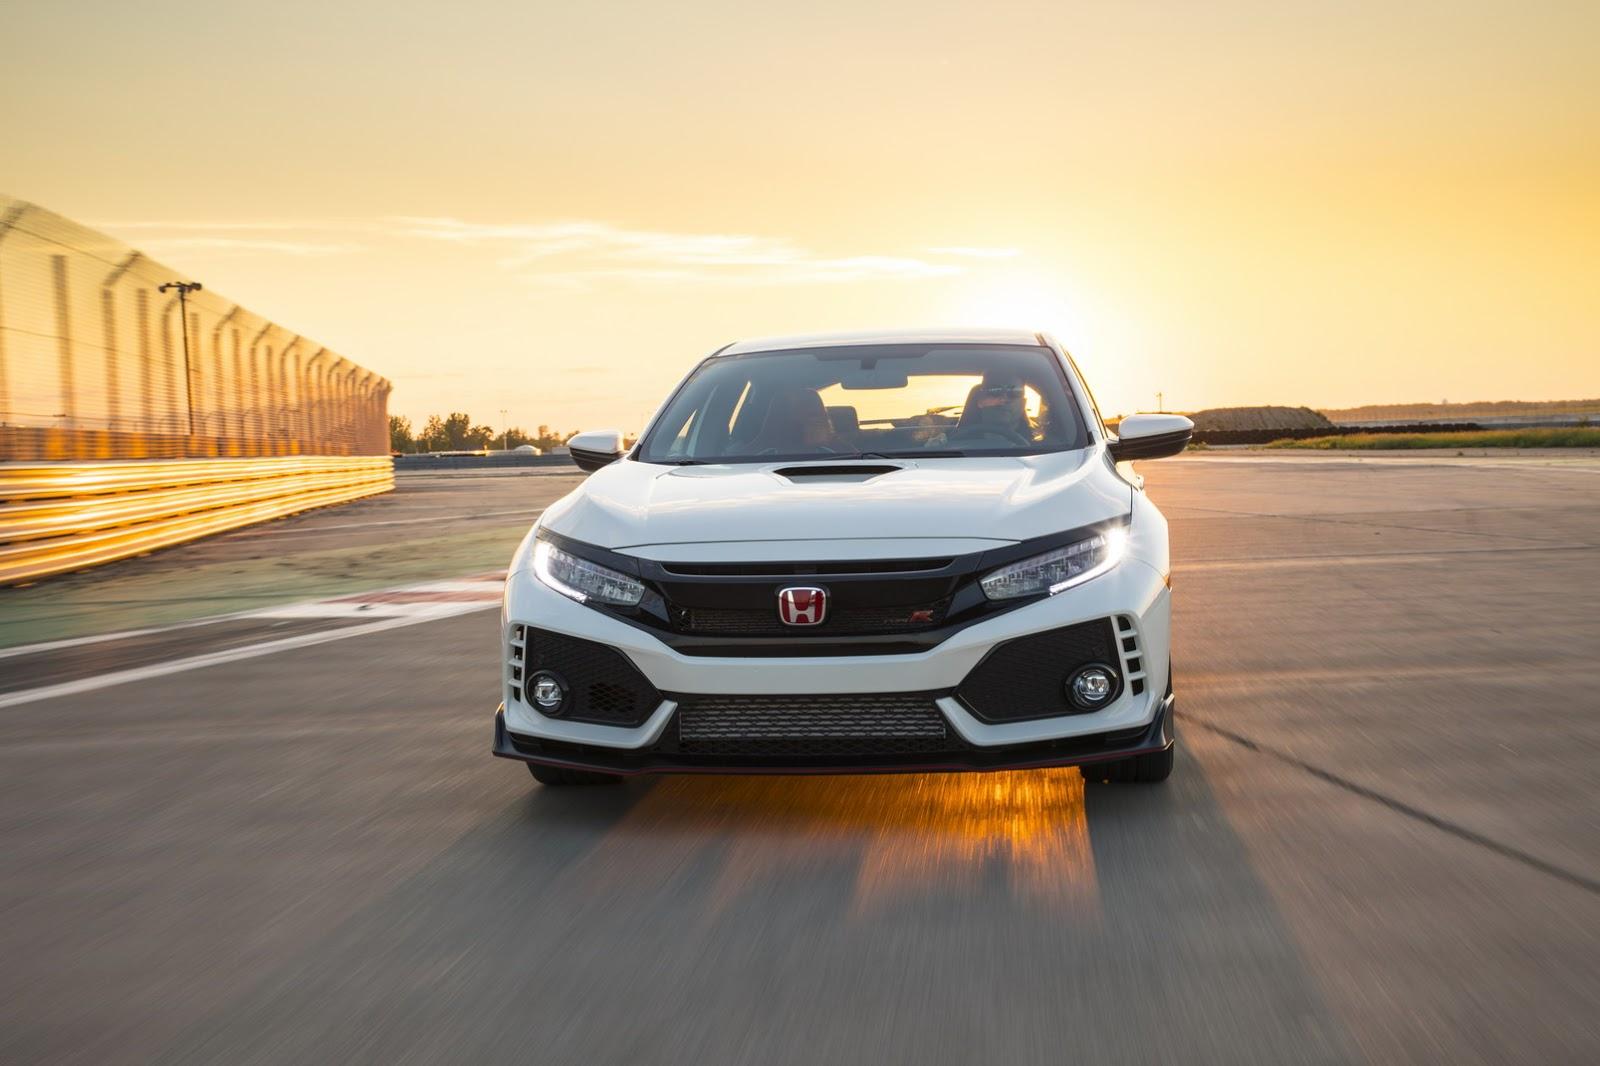 2017_Honda_Civic_Type_R_168